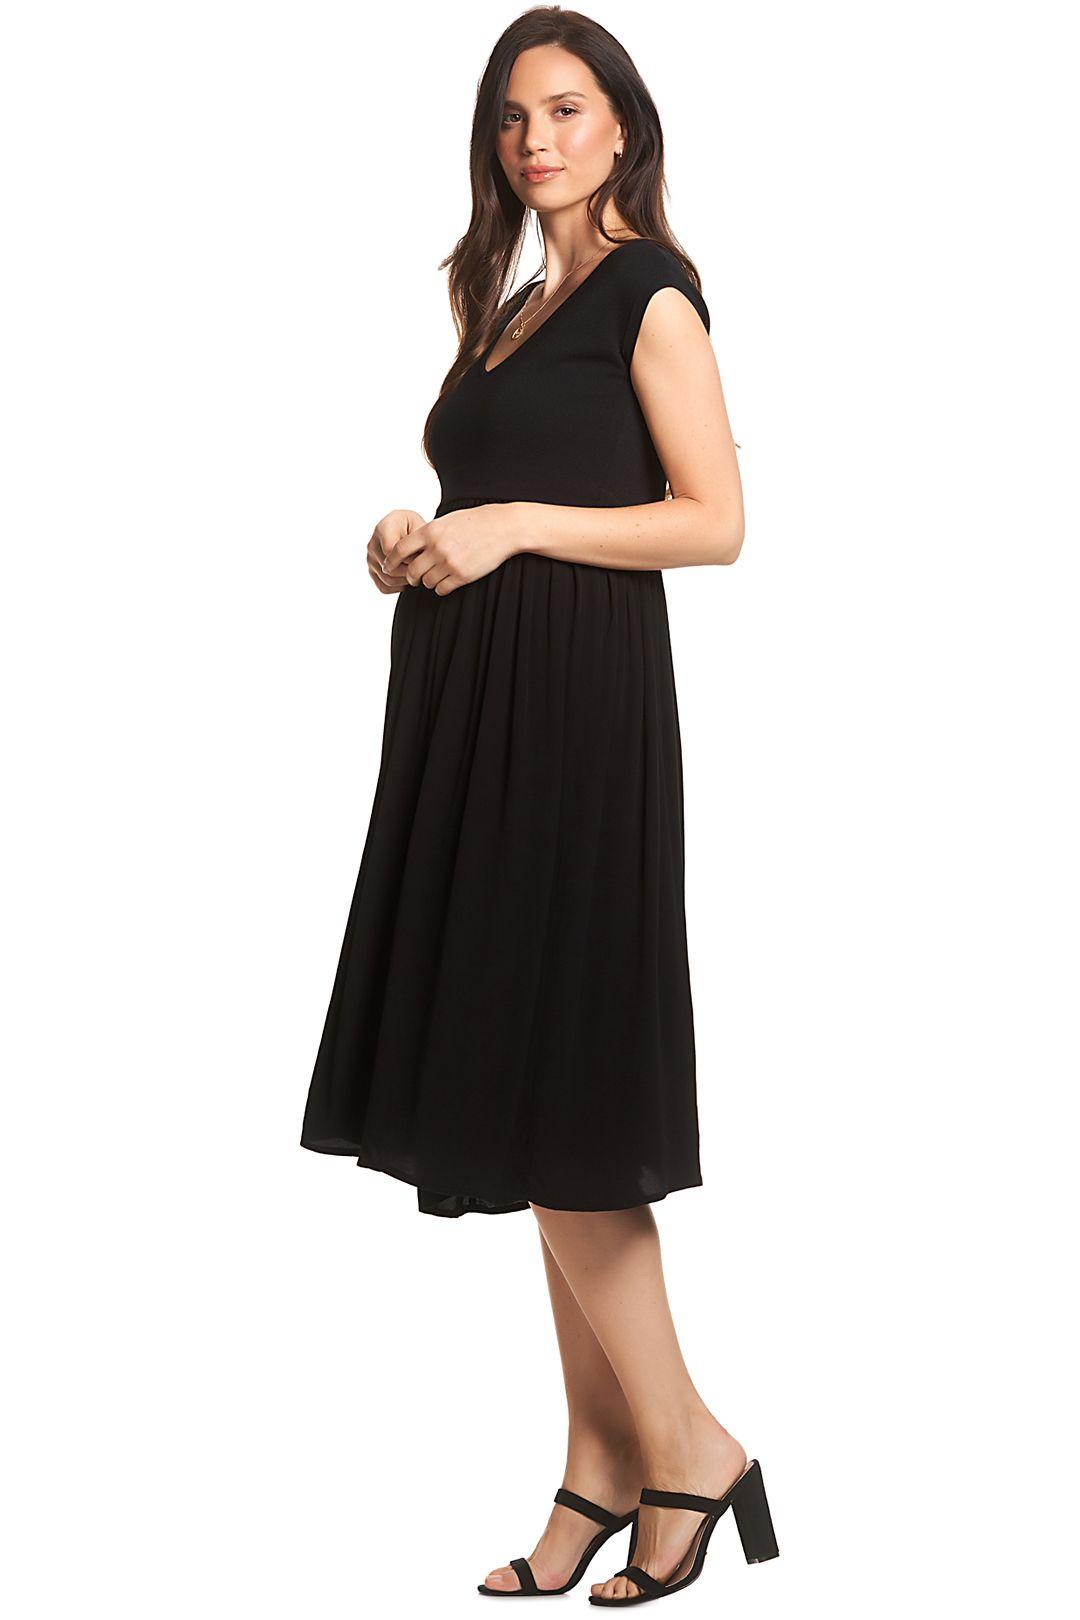 Soon-Maternity-Francis-Feeding-Midi-Dress-Black-Side